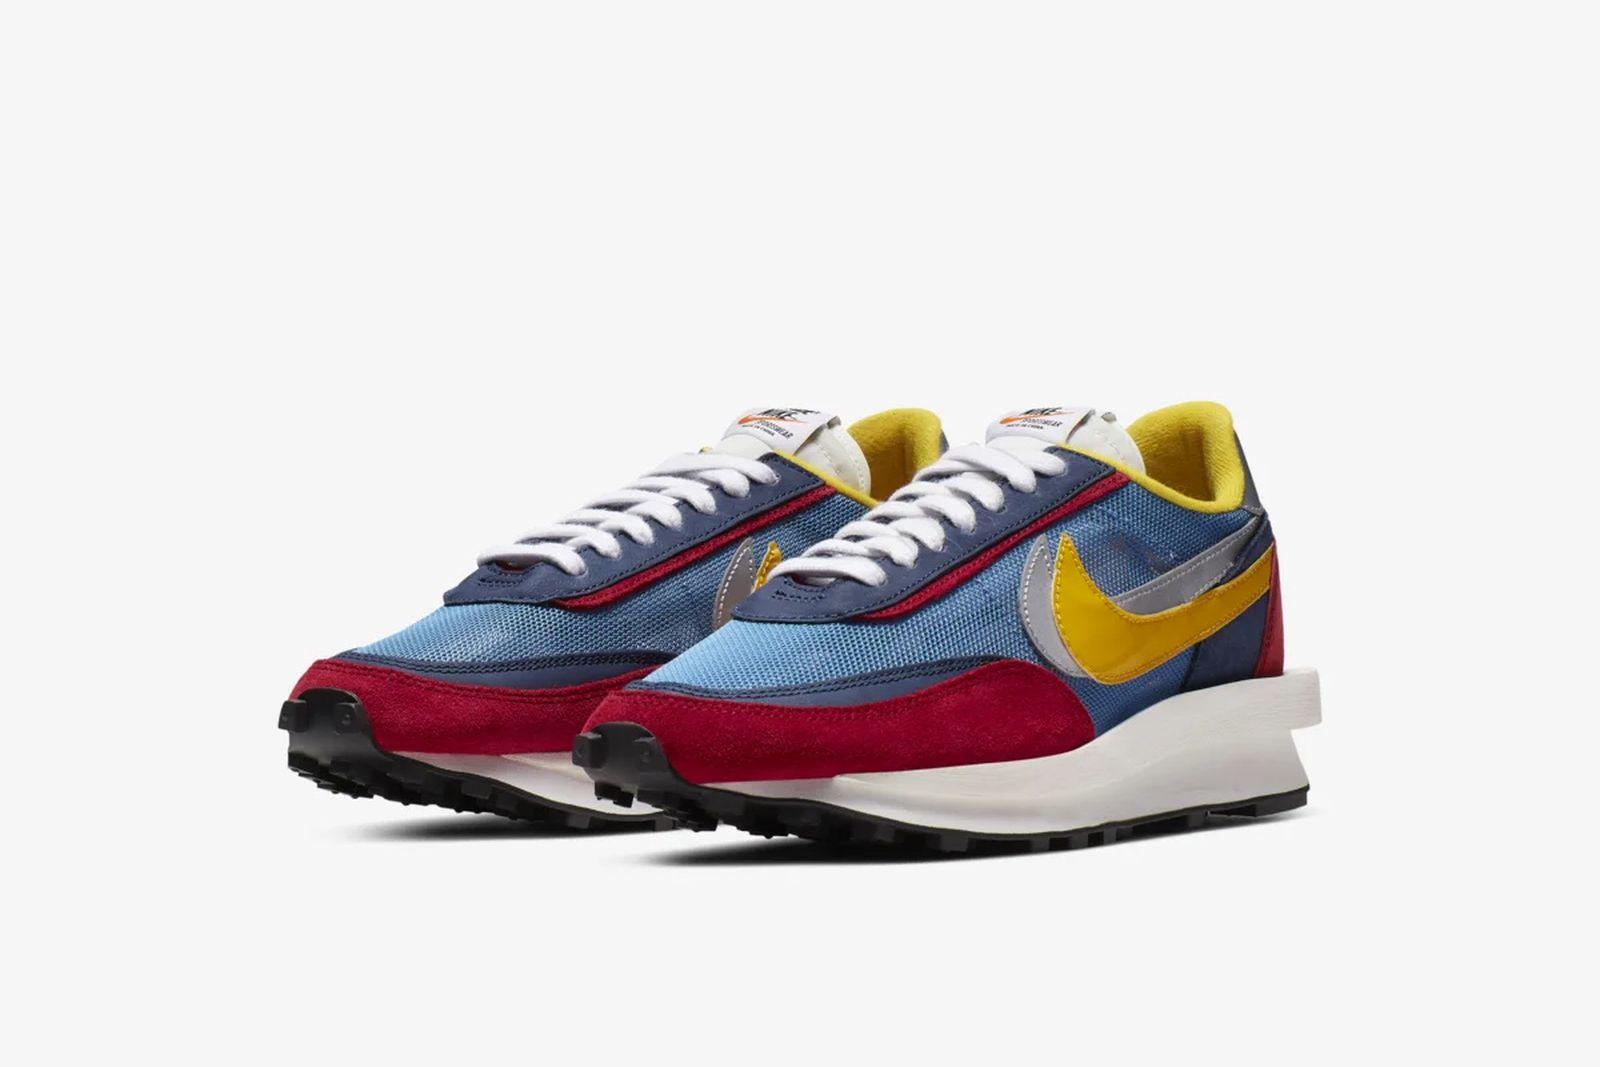 sacai nike ldwaffle blazer mid release date price product Converse GOLF Le FLEUR* Fear of God x Nike New Balance